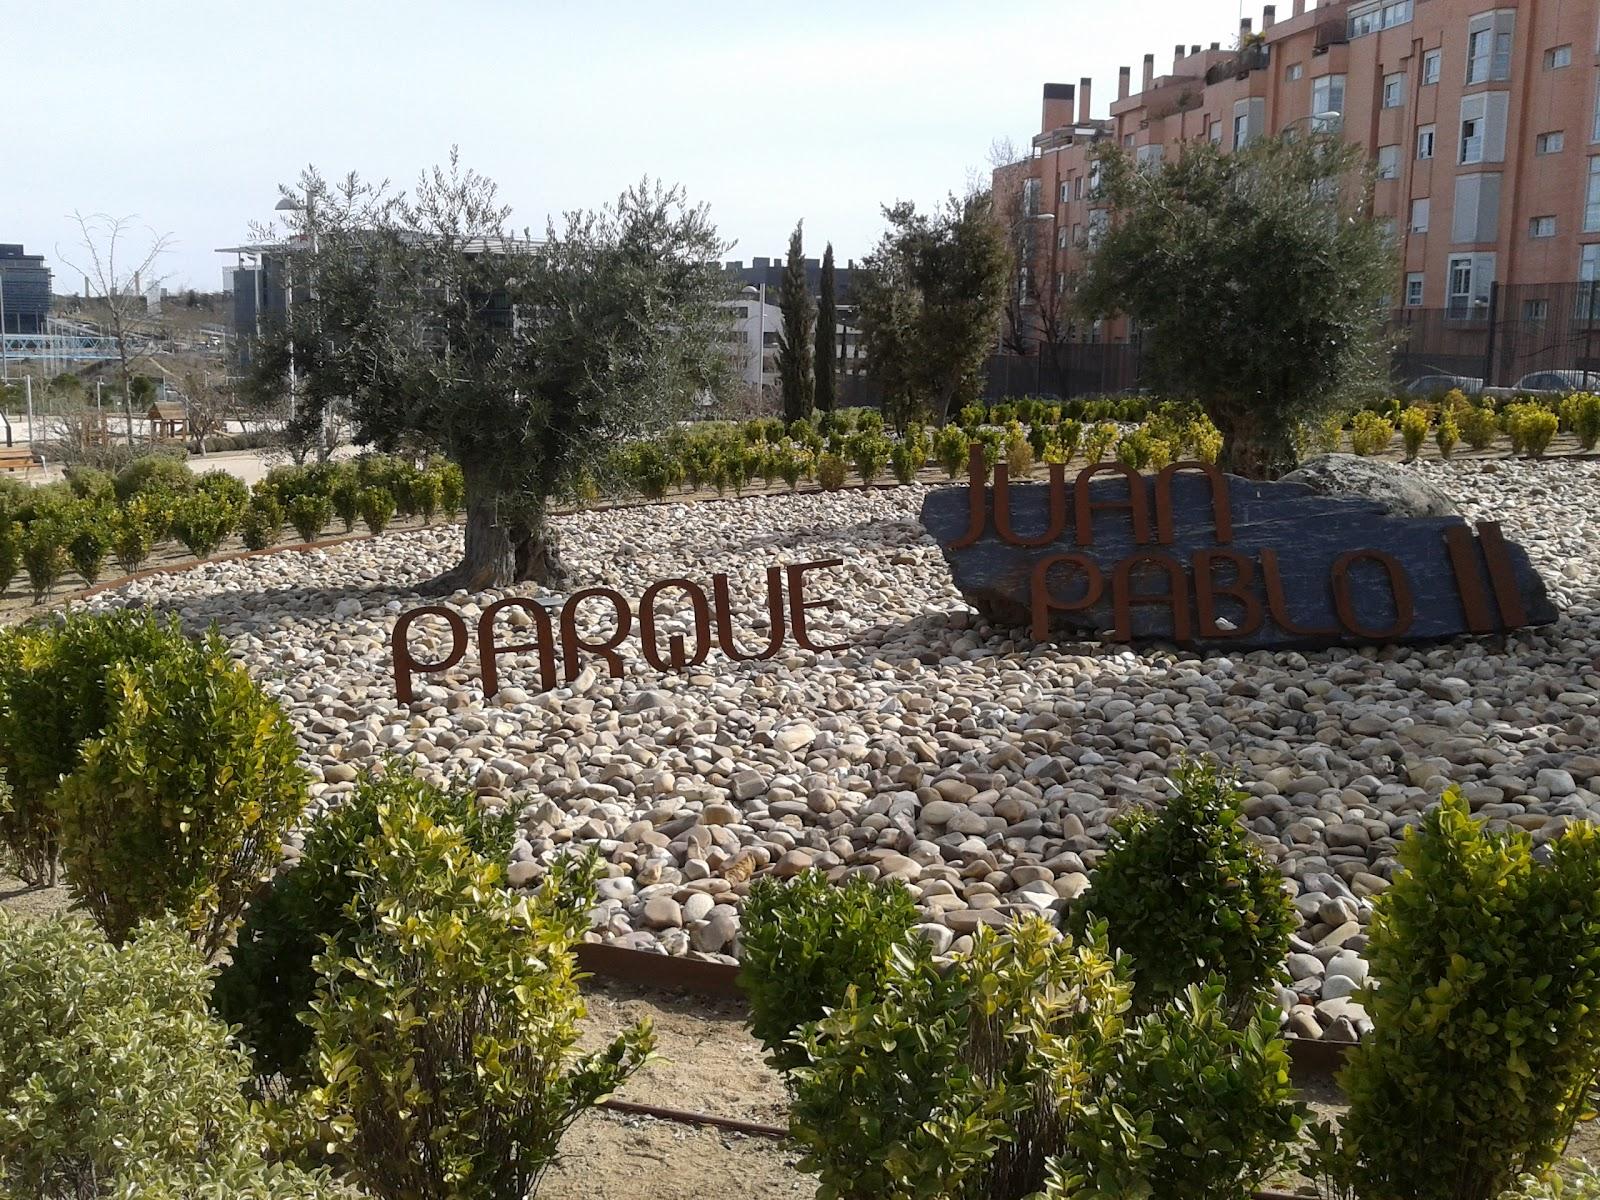 Nosolometro H Bitat Madrid Verano Visita Guiada Al